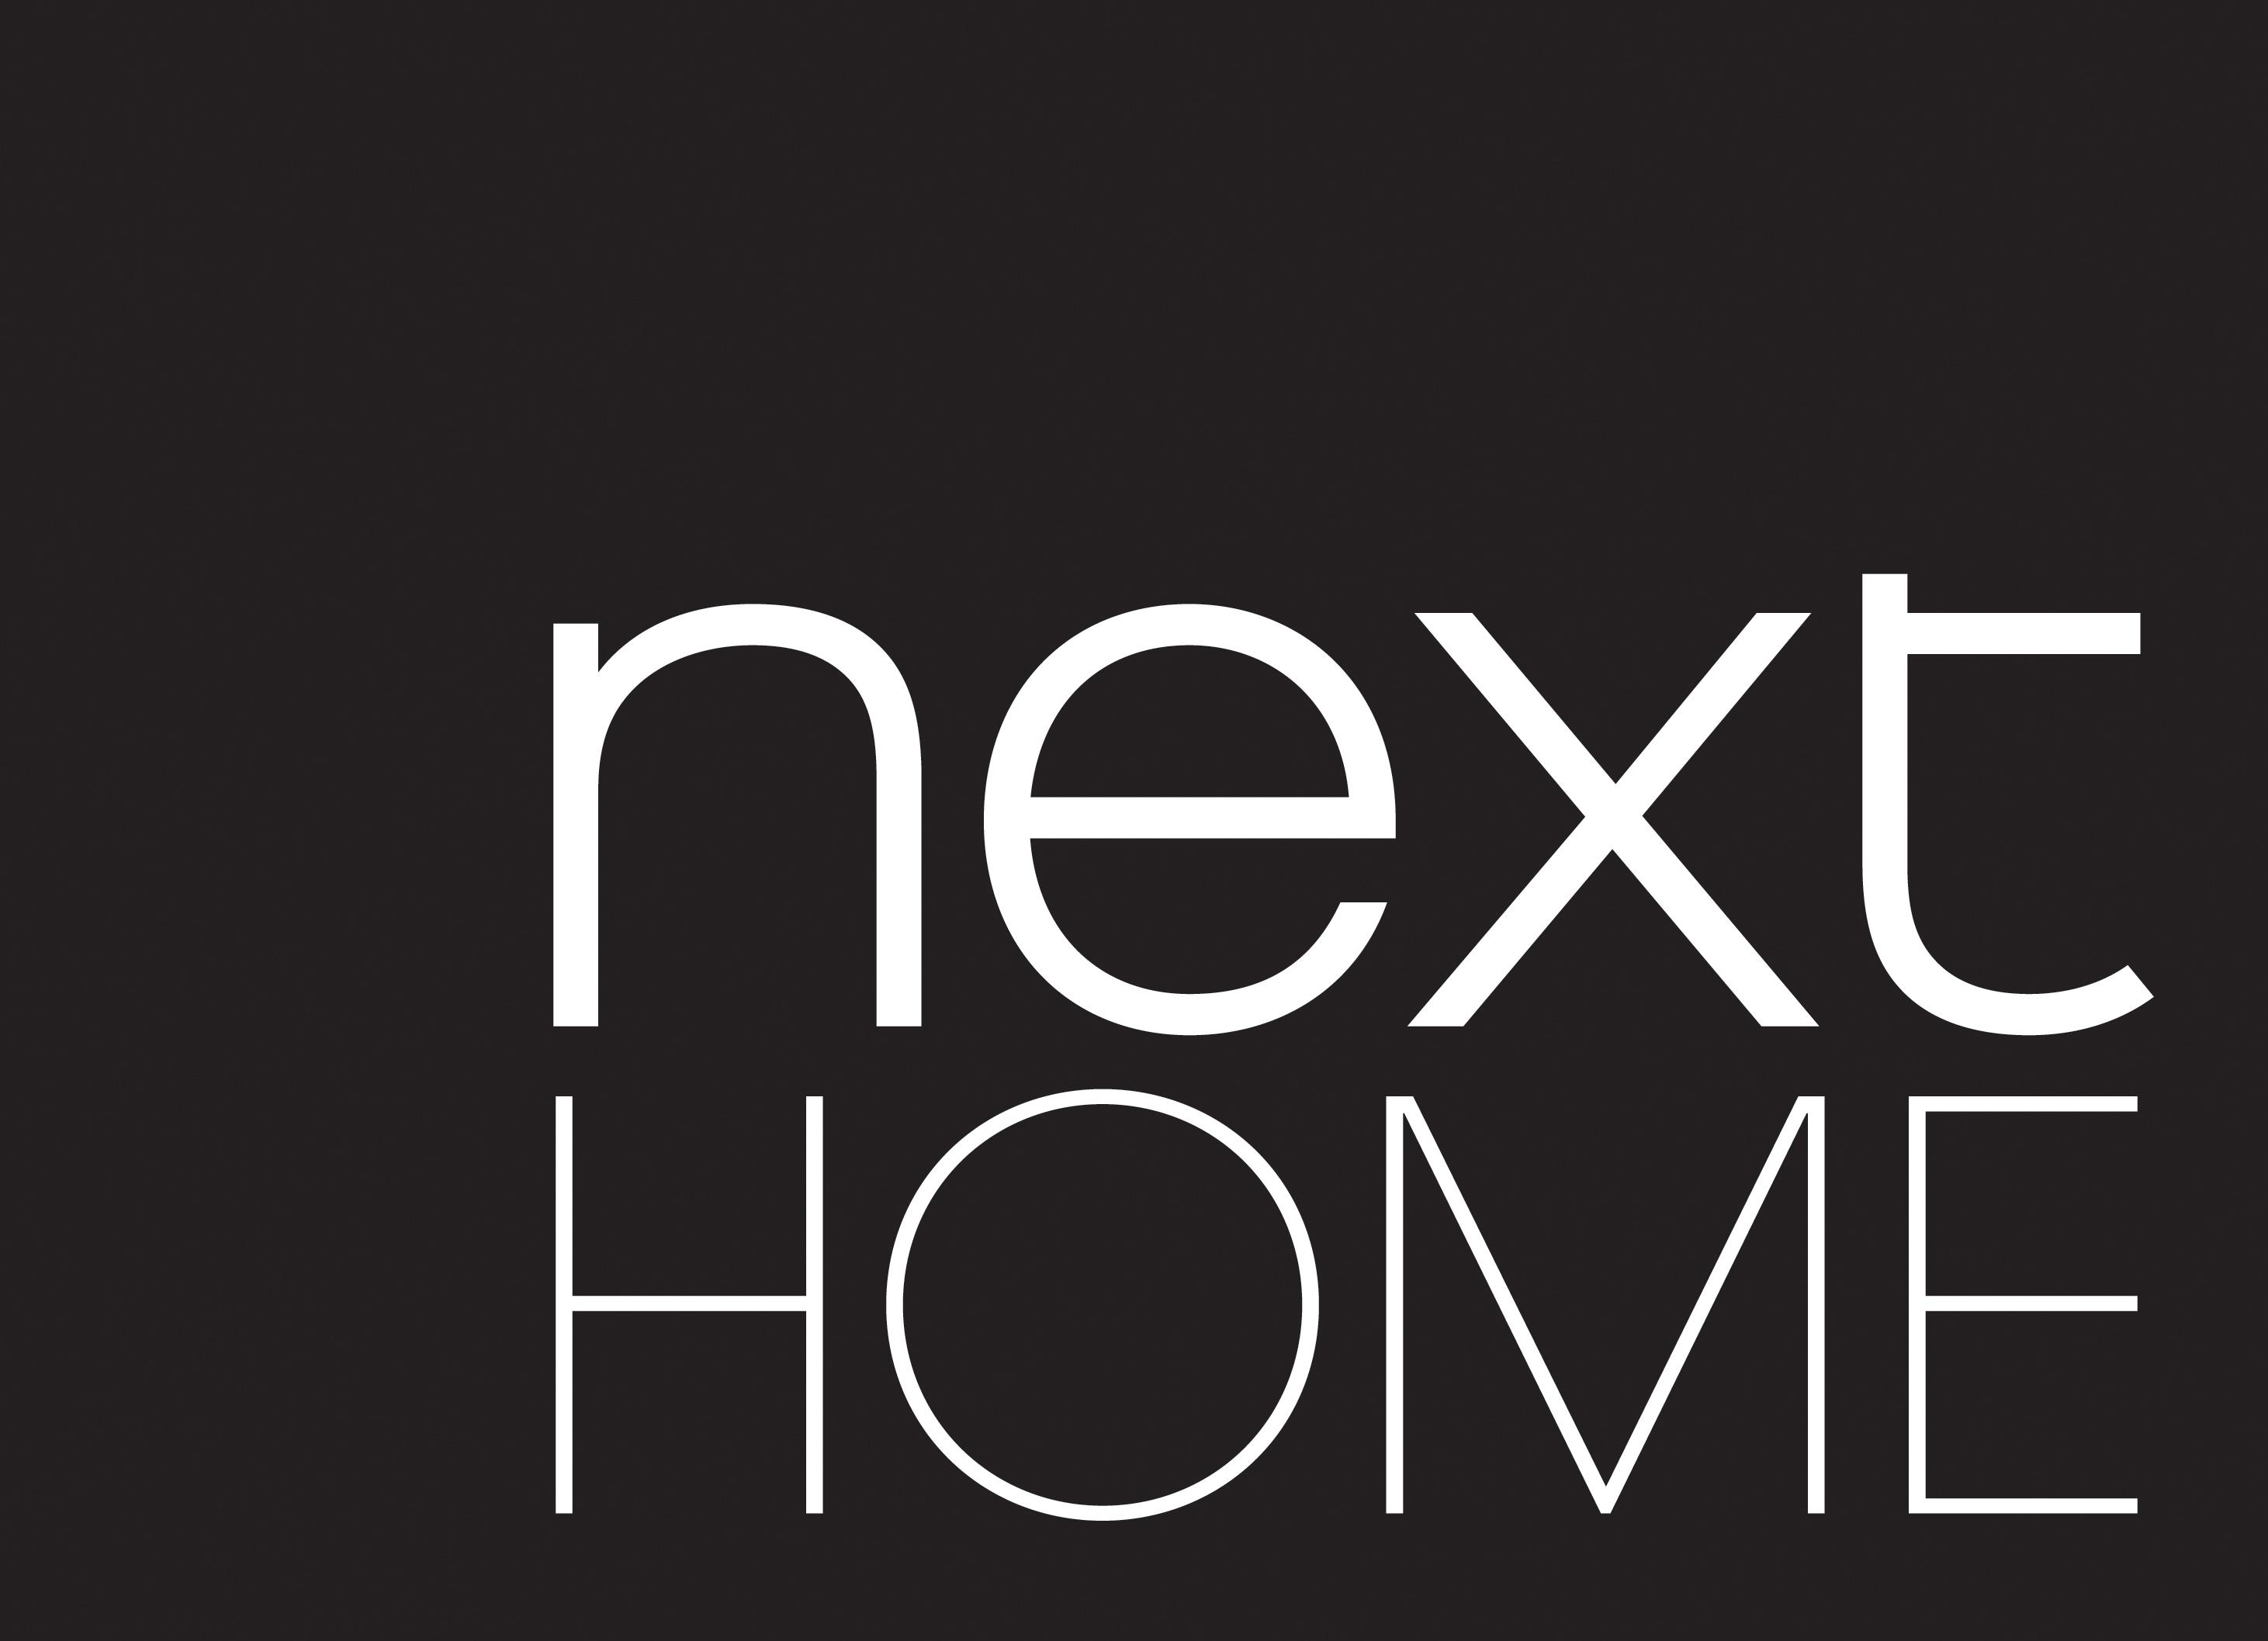 Mac Os X Interior Design Software Interior Design And Home Why Consider An Imac As Your